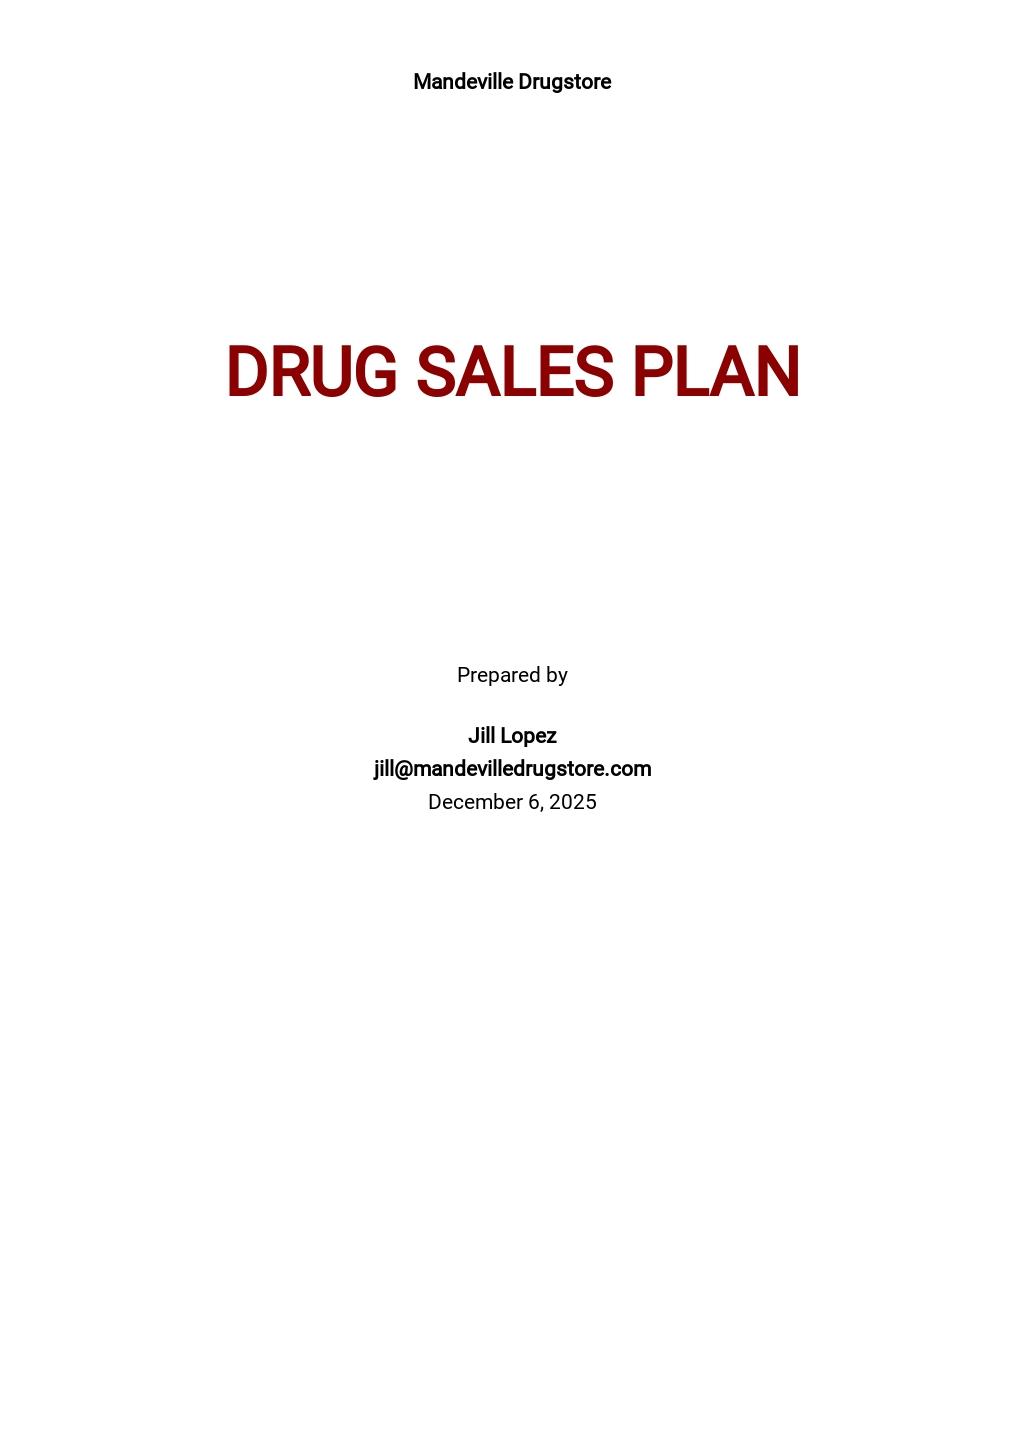 Pharma or Drug Sales Plan Template